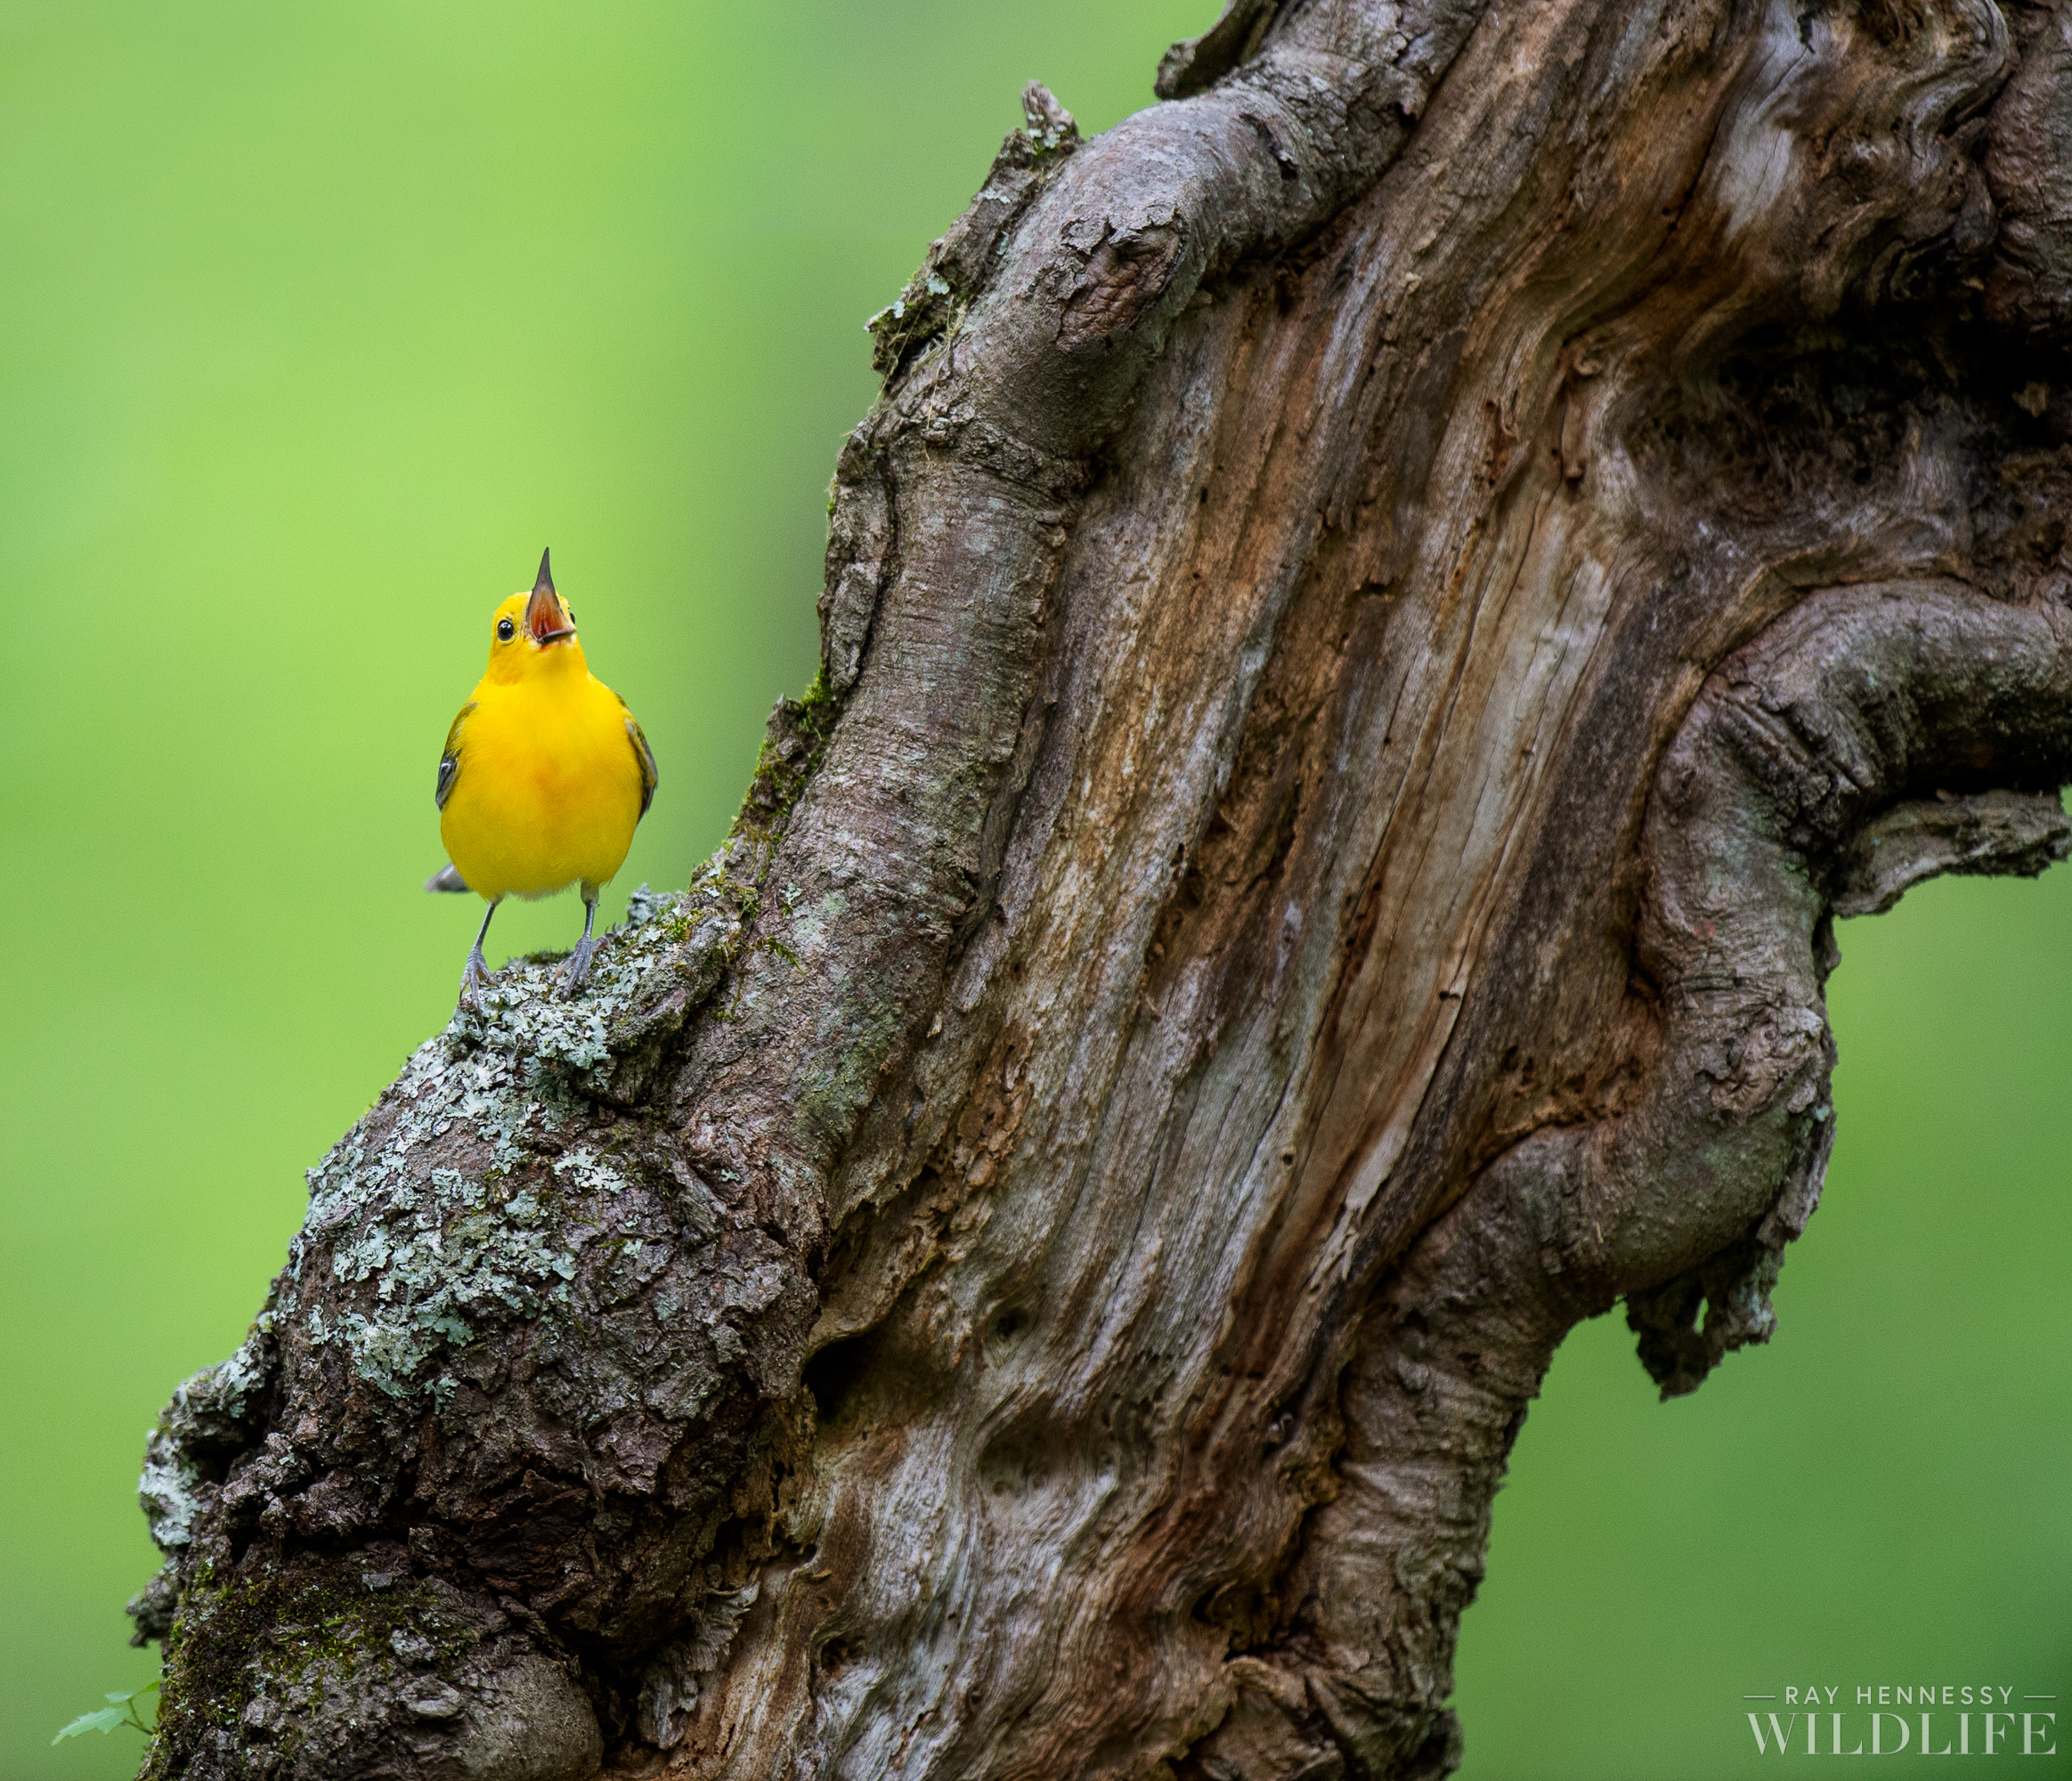 003_Prothonotary Warbler.jpg